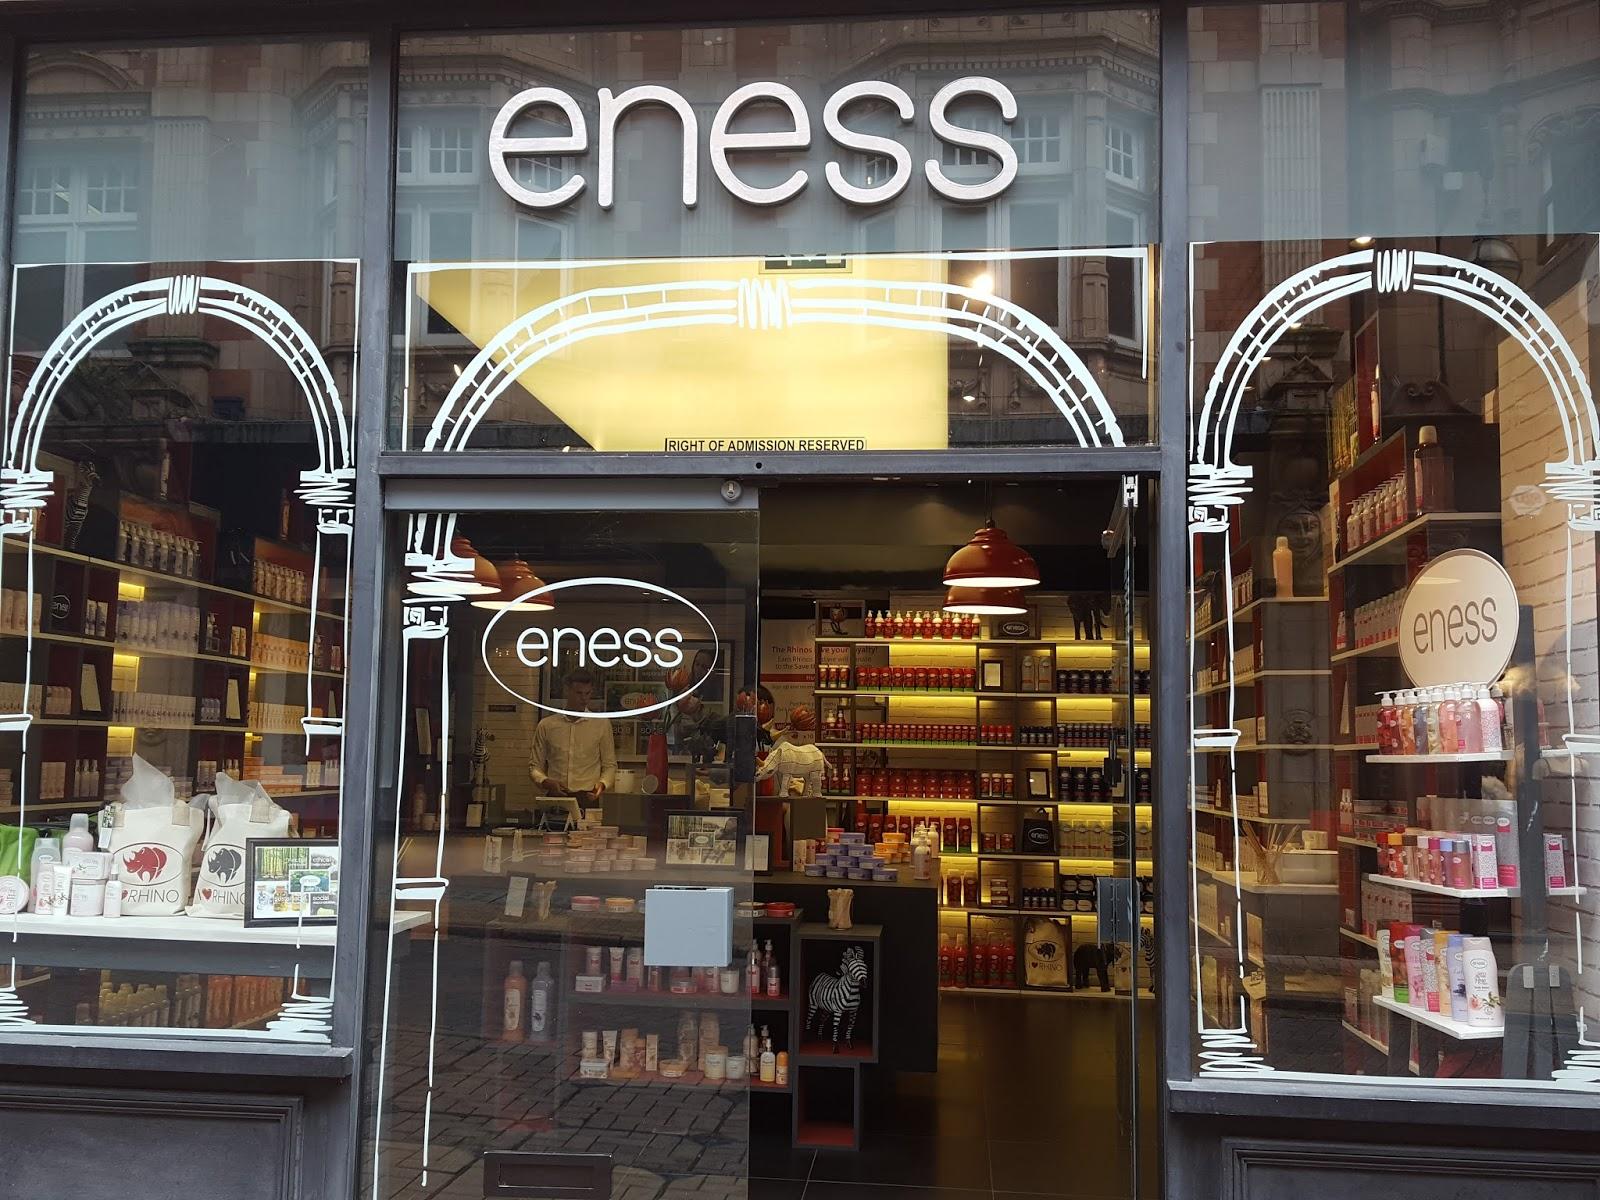 Eness beauty brand in Birmingham | sian victoria beauty blogger